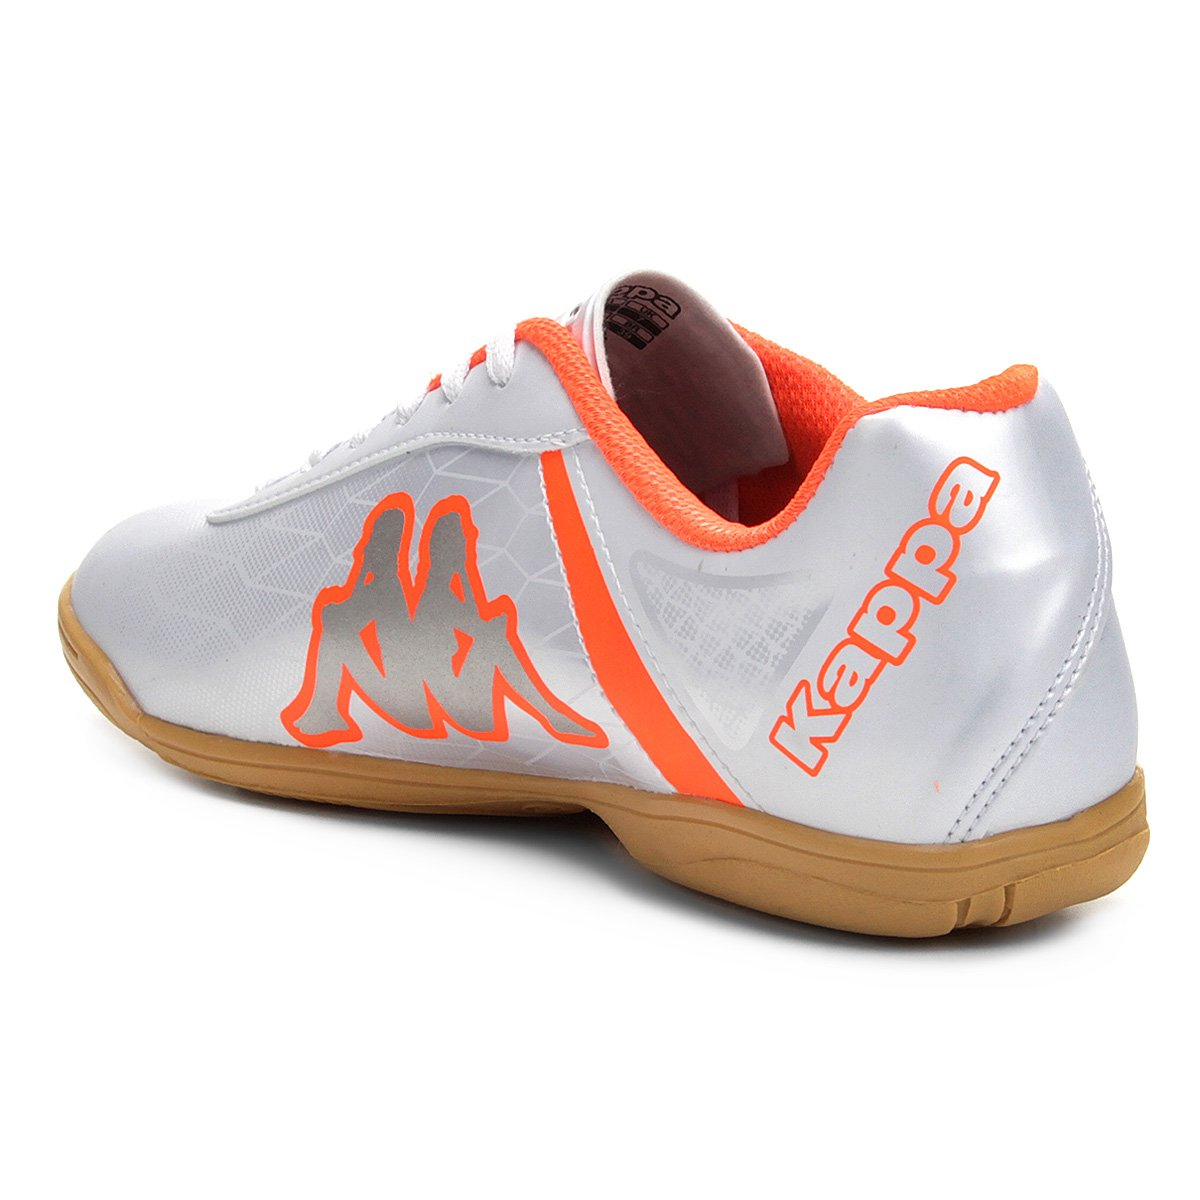 a68194cf9e Chuteira Futsal Kappa Torpedo - Branco e Laranja - Compre Agora ...